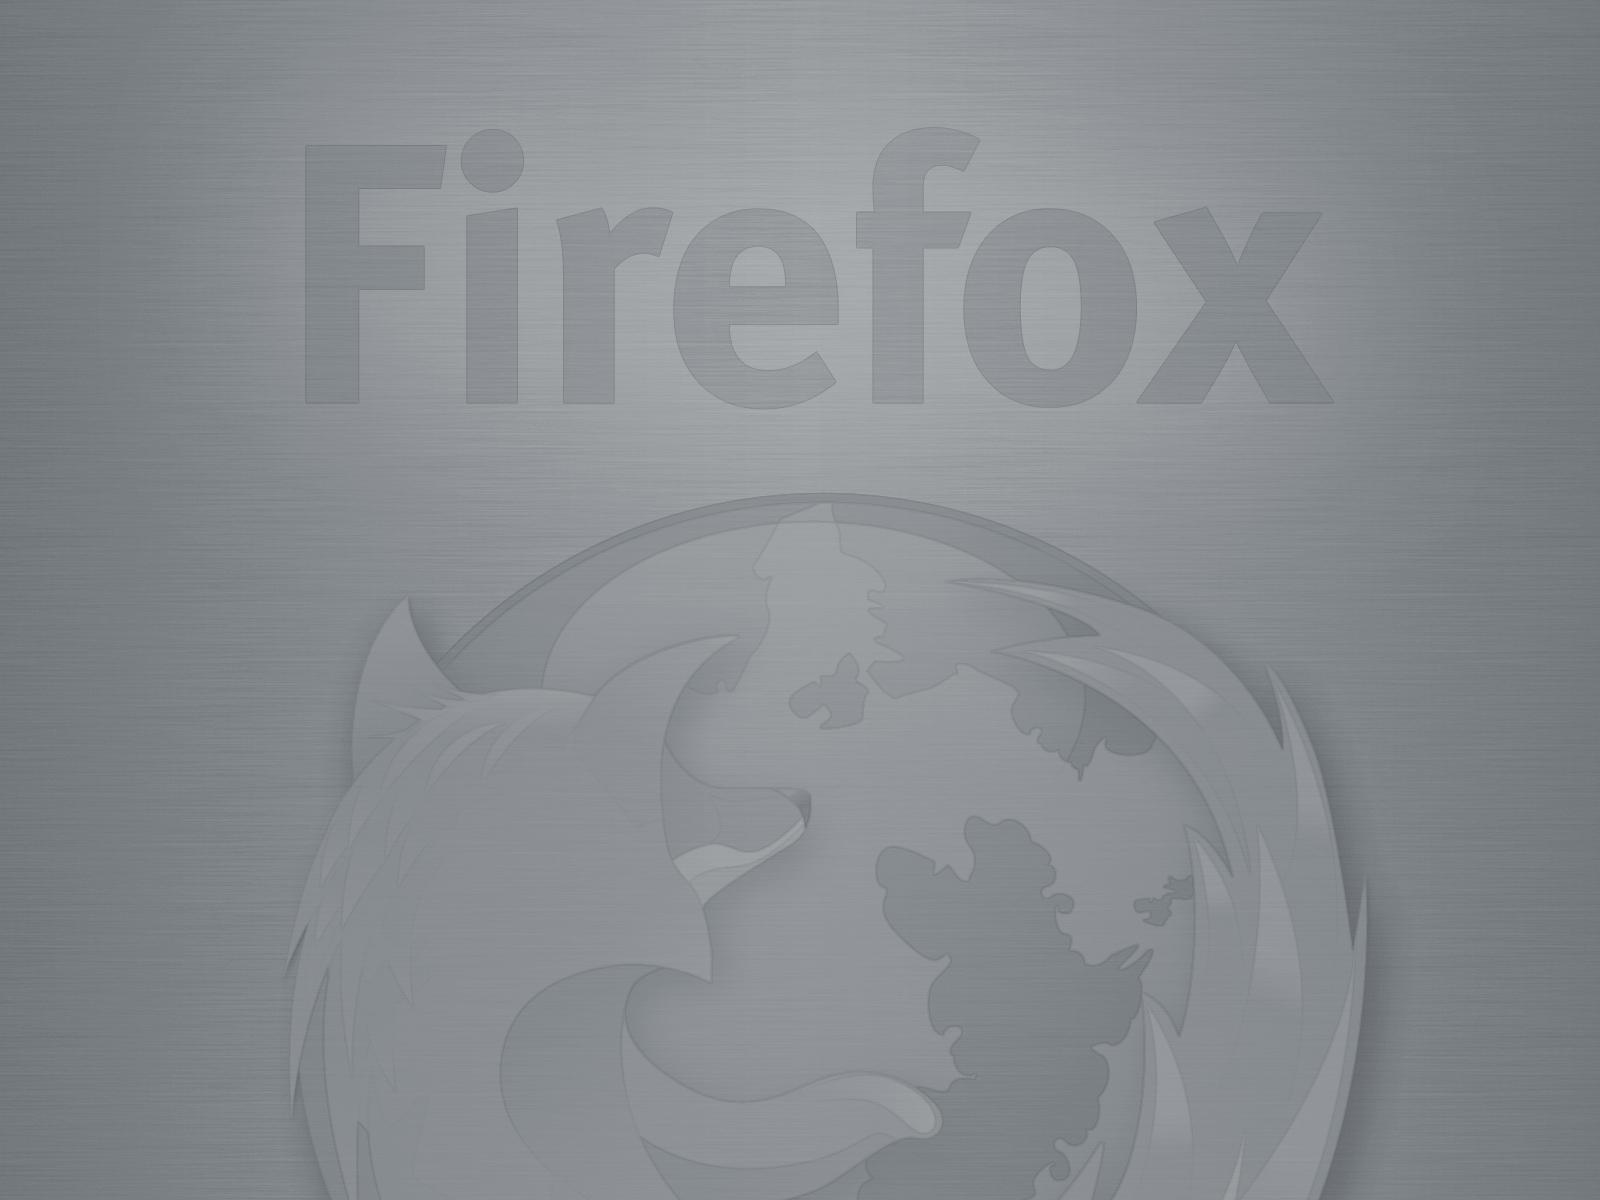 http://3.bp.blogspot.com/-yOzxGS5FXSE/Tgm3z79U4UI/AAAAAAAAA84/Ib8fAMJUNGE/s1600/firefox1%2Bby%2Bwww.bdtvstar.com%2B%252826%2529.jpg